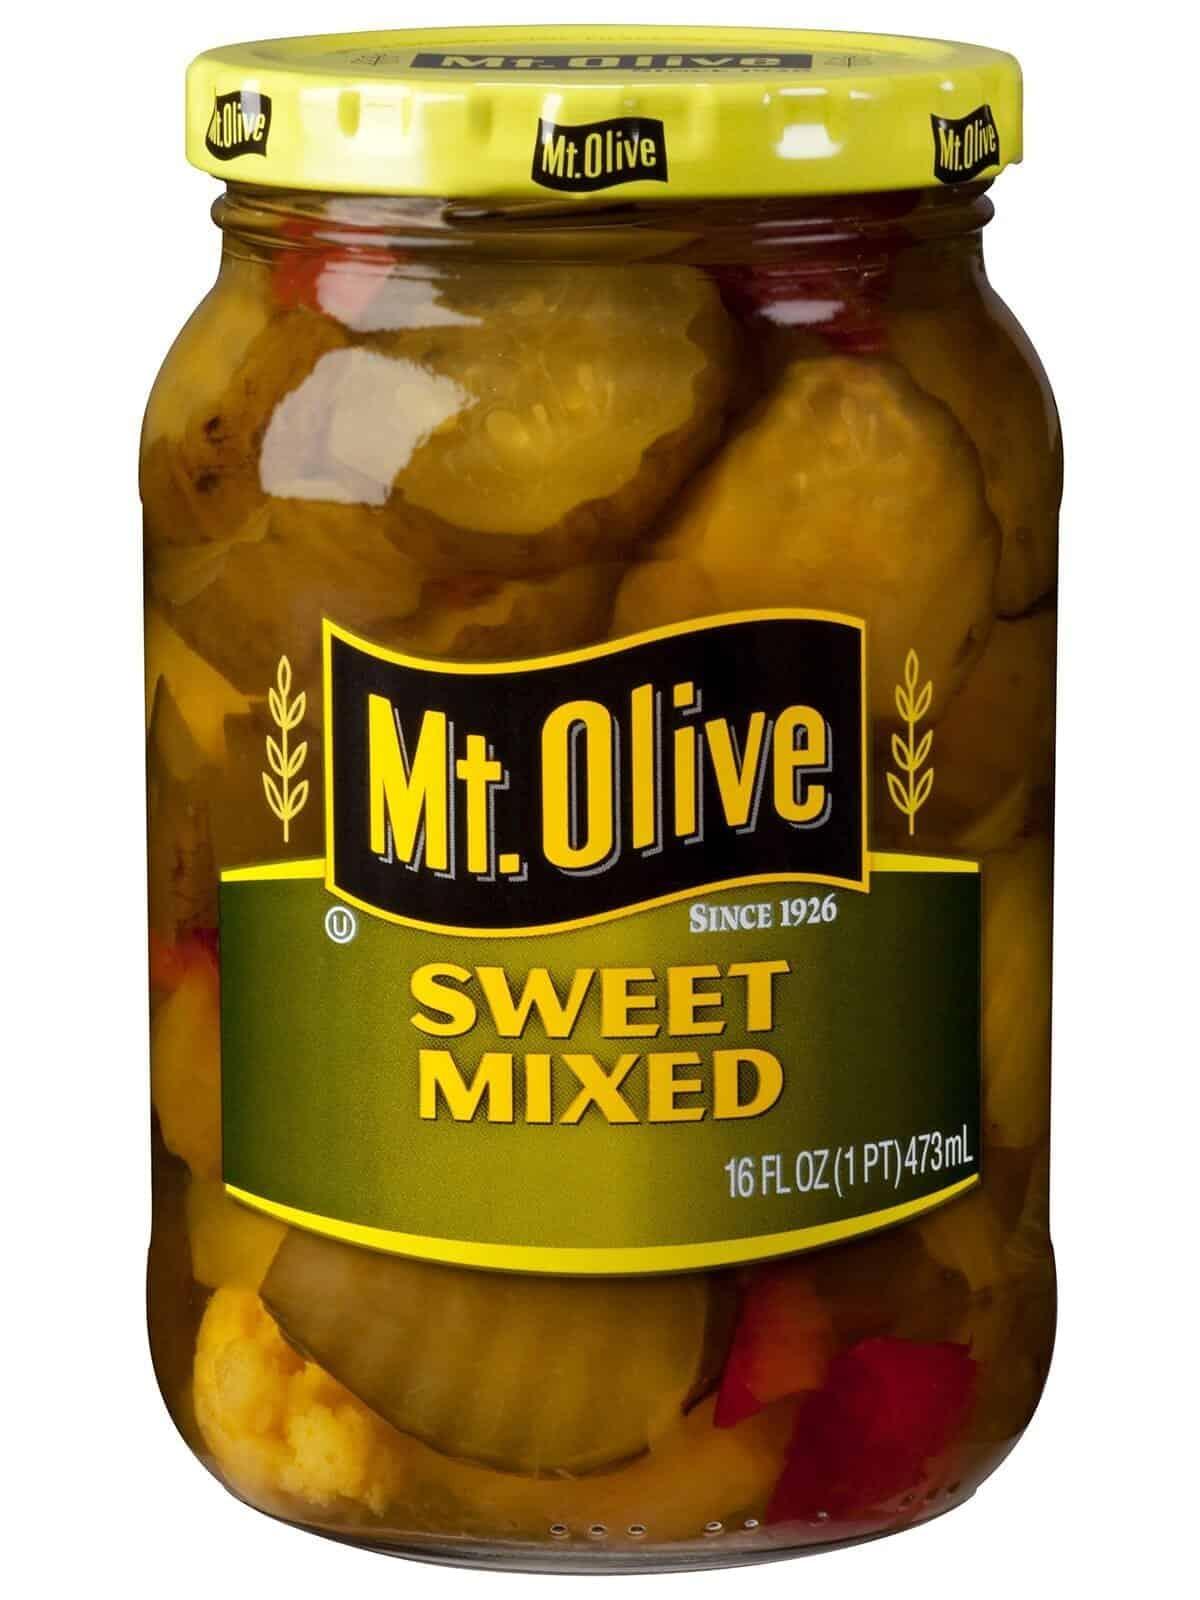 Mt. Olive Sweet Mixed Jar